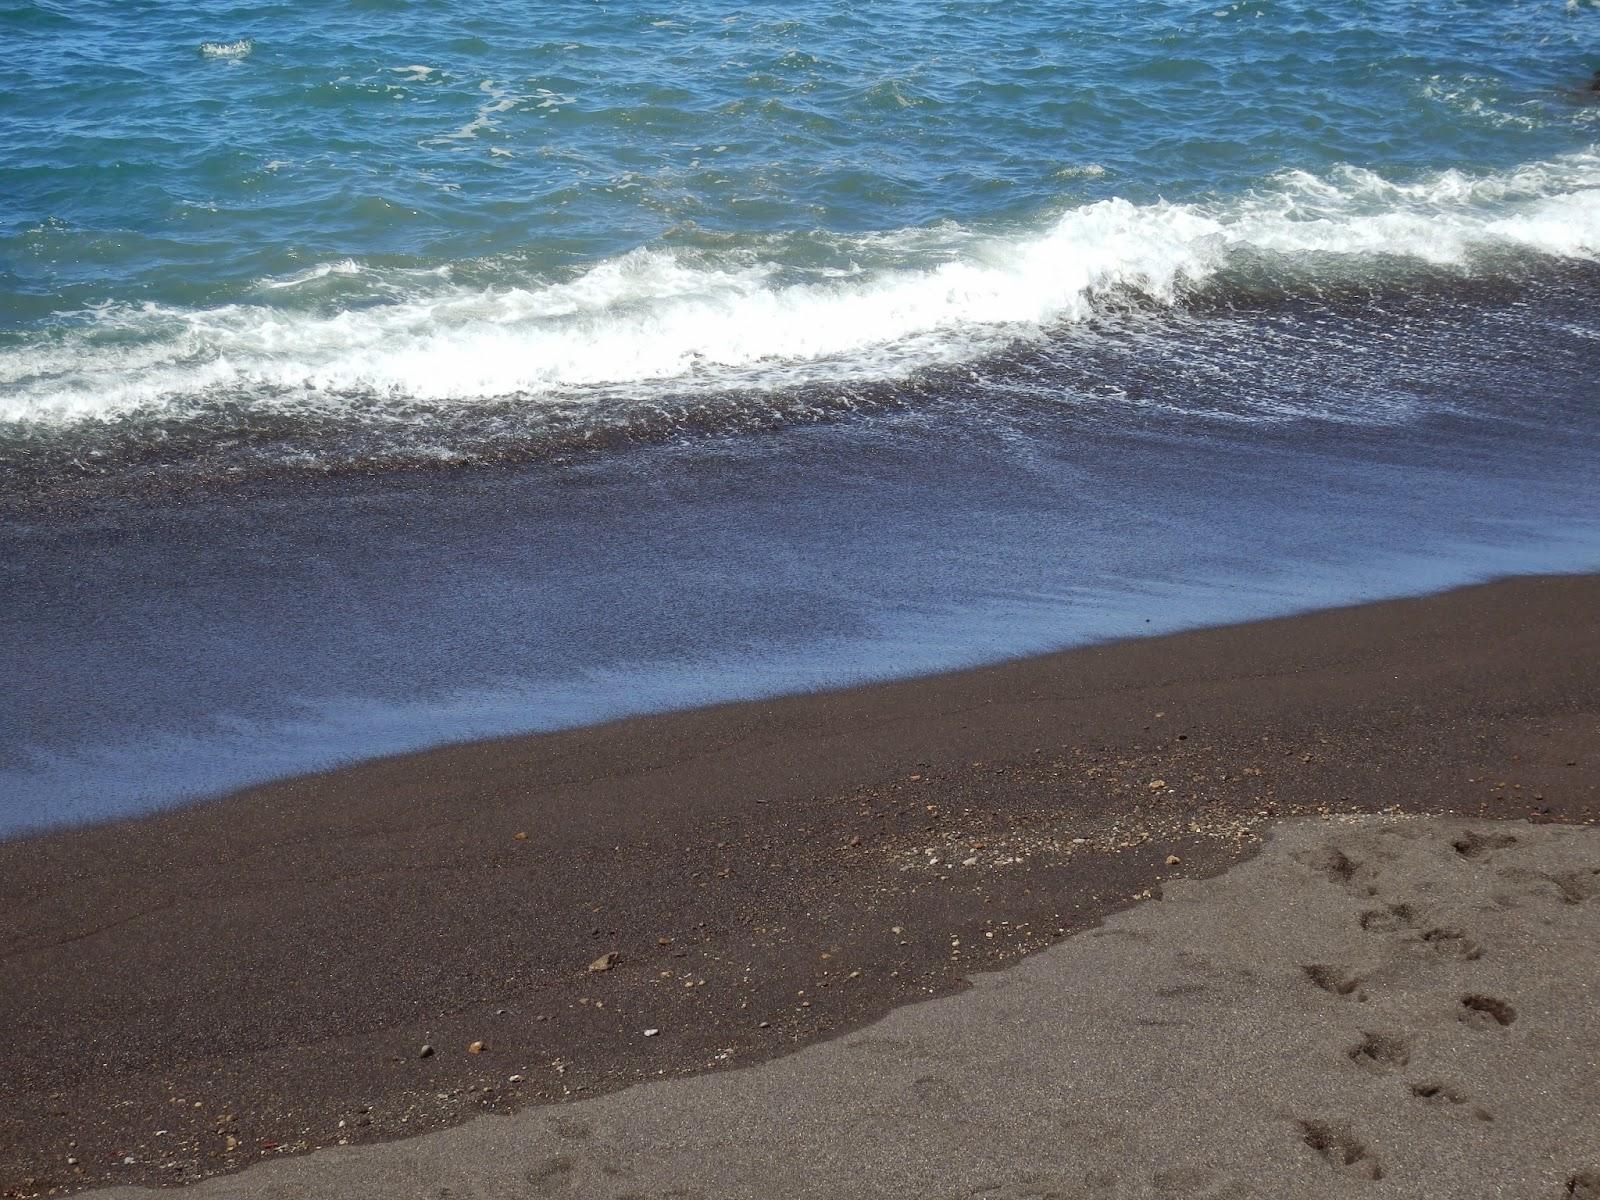 Black sand on Tenerife beach